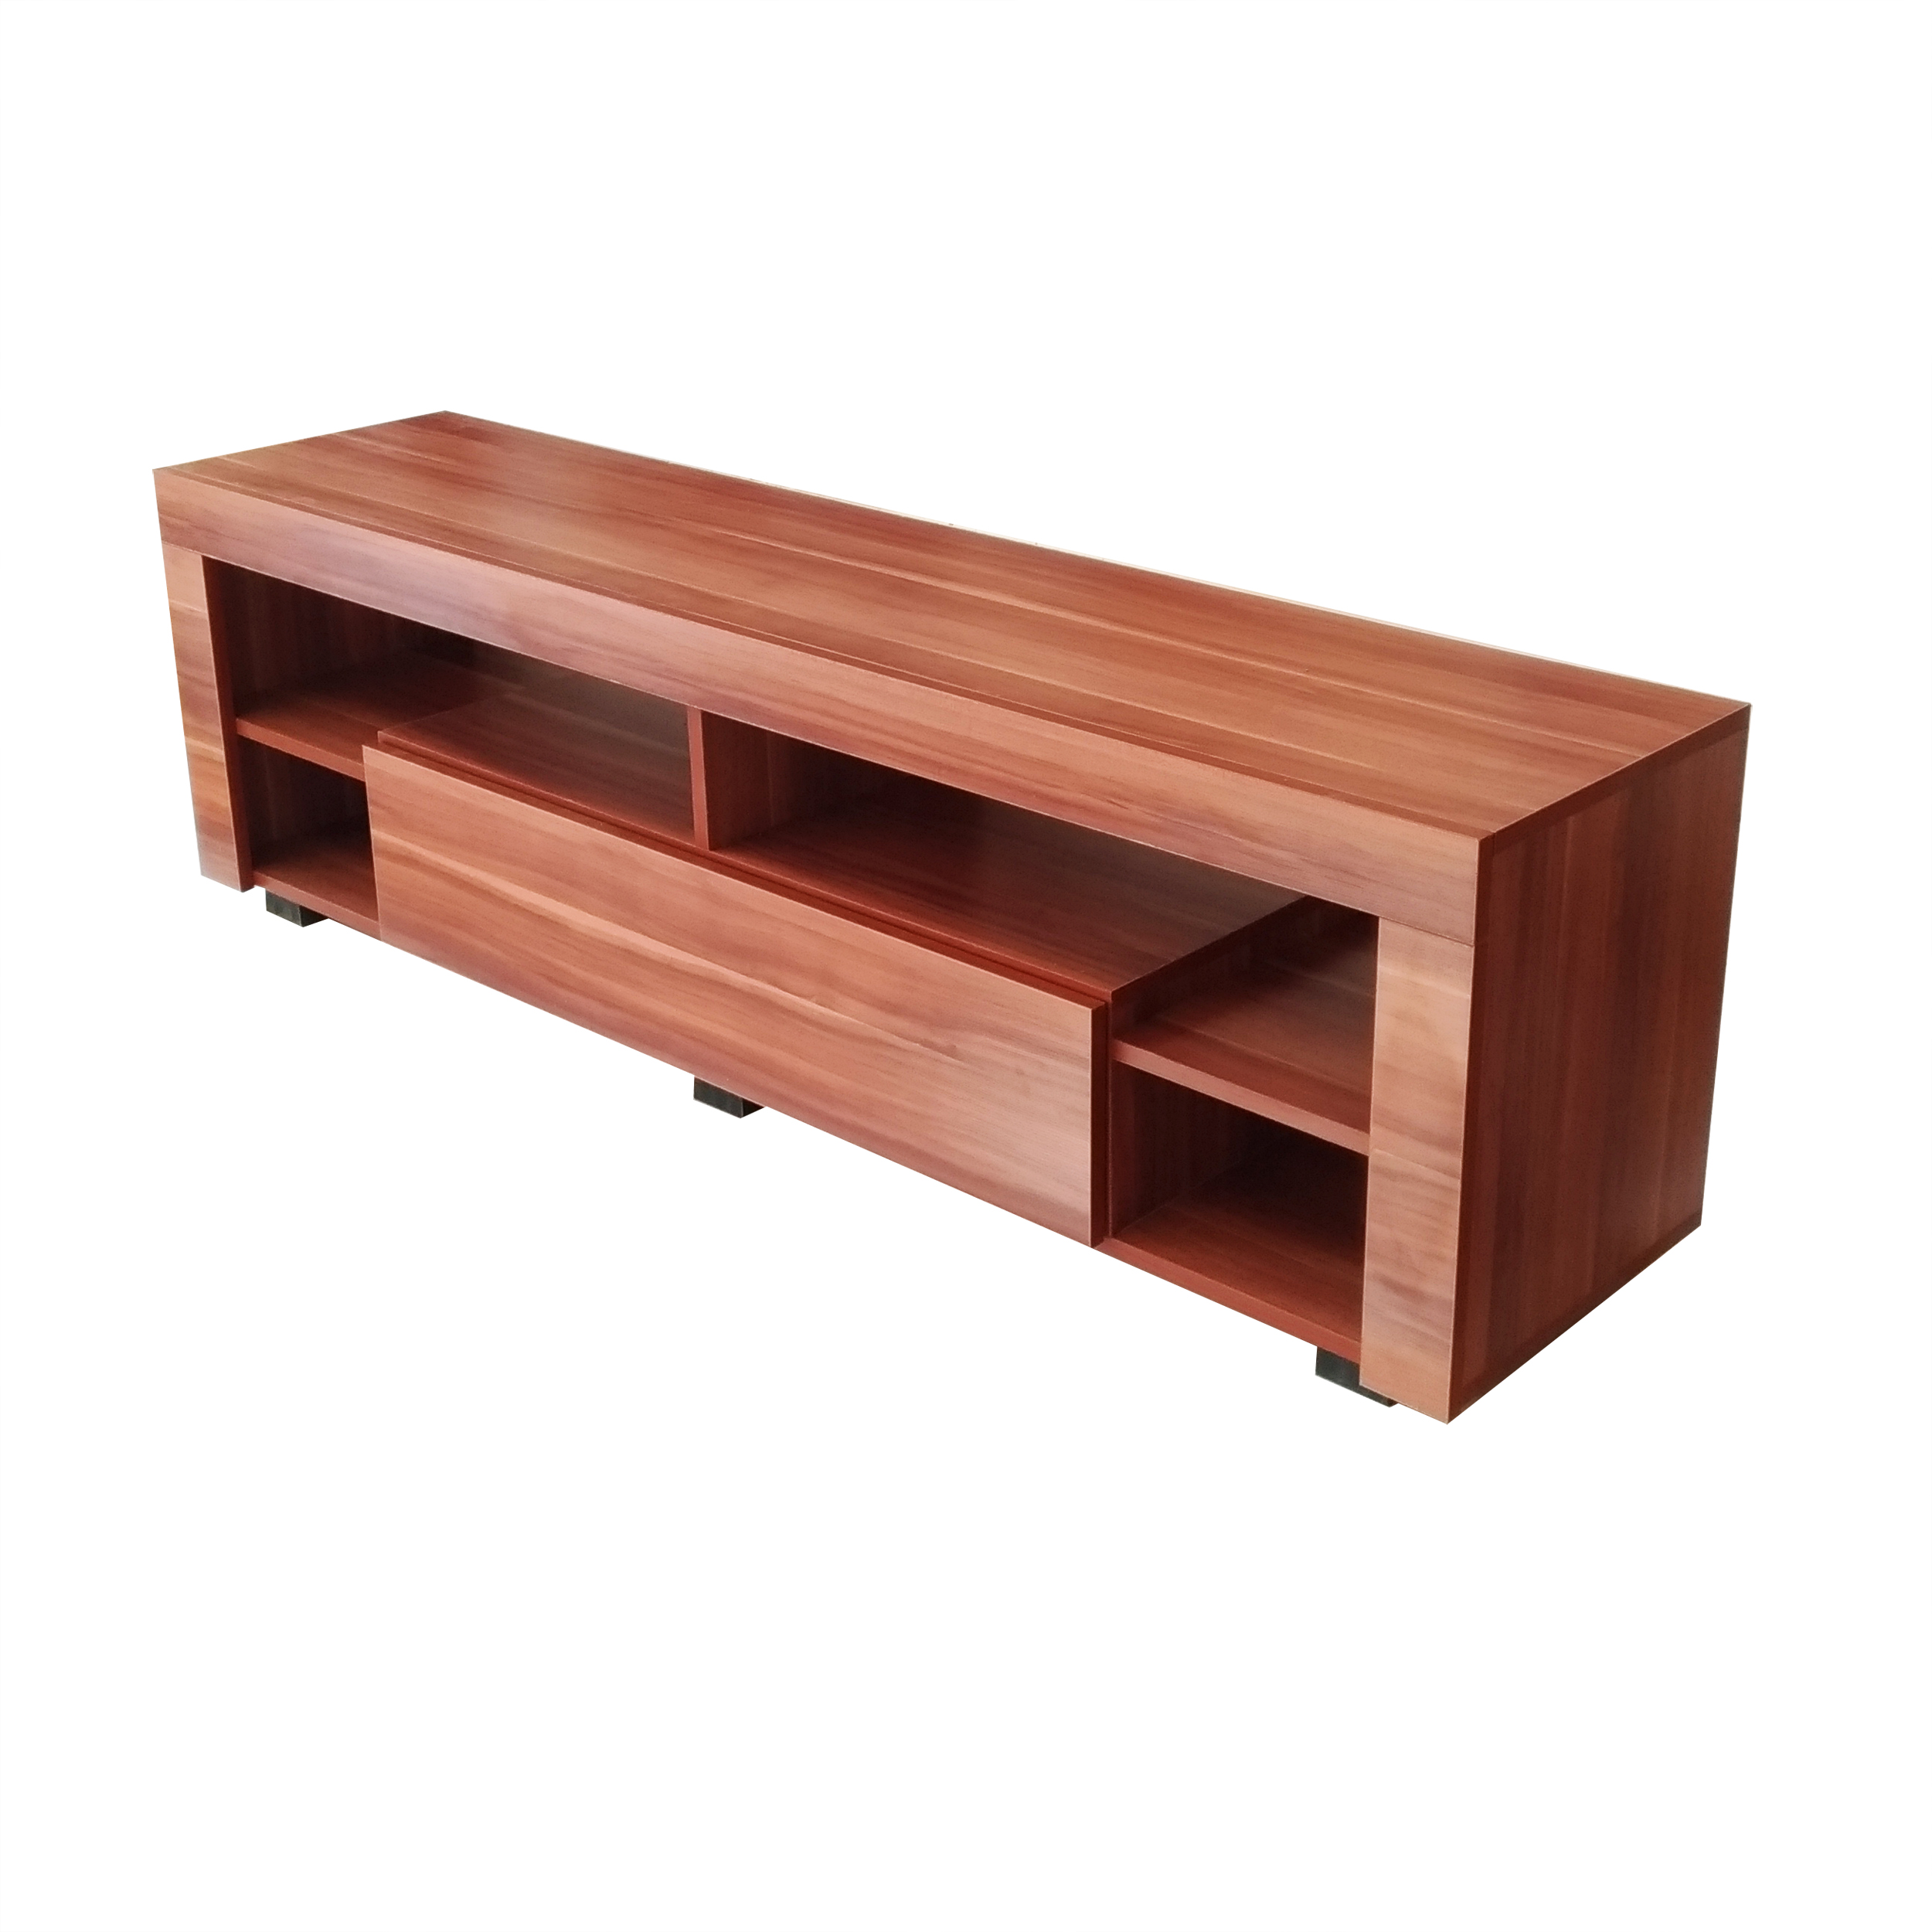 میز تلوزیون مدل HiM-1